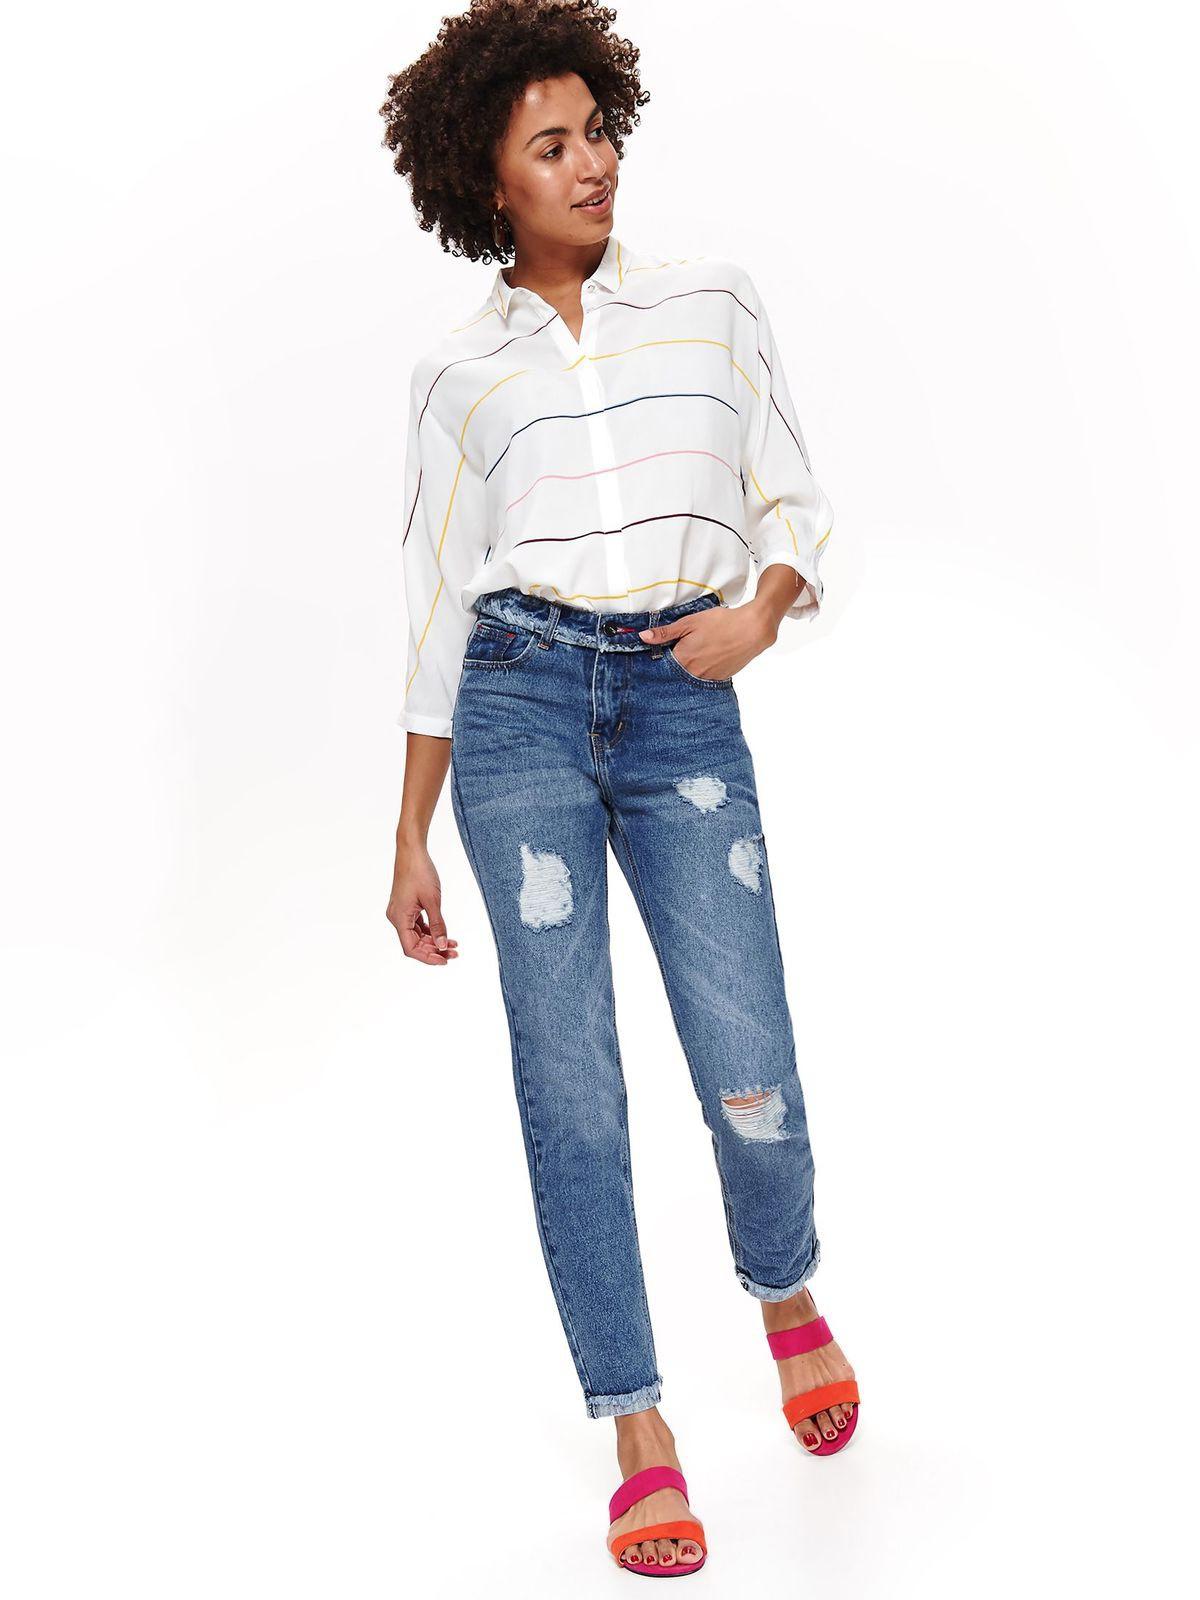 top secret γυναικειο jean παντελονι